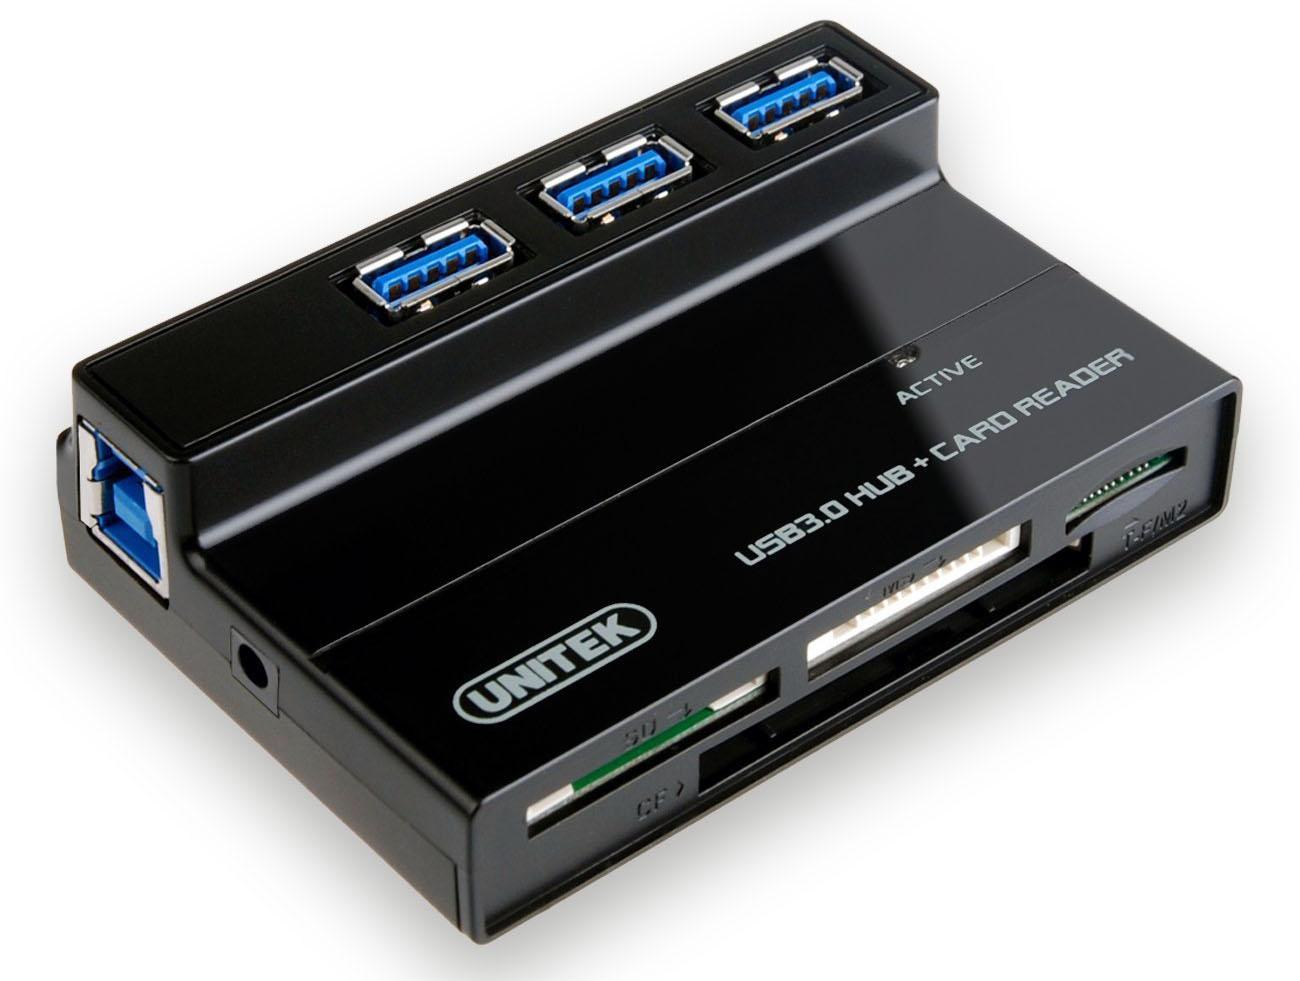 Review: Unitek 3 Port USB 3.0 Hub with Card Reader